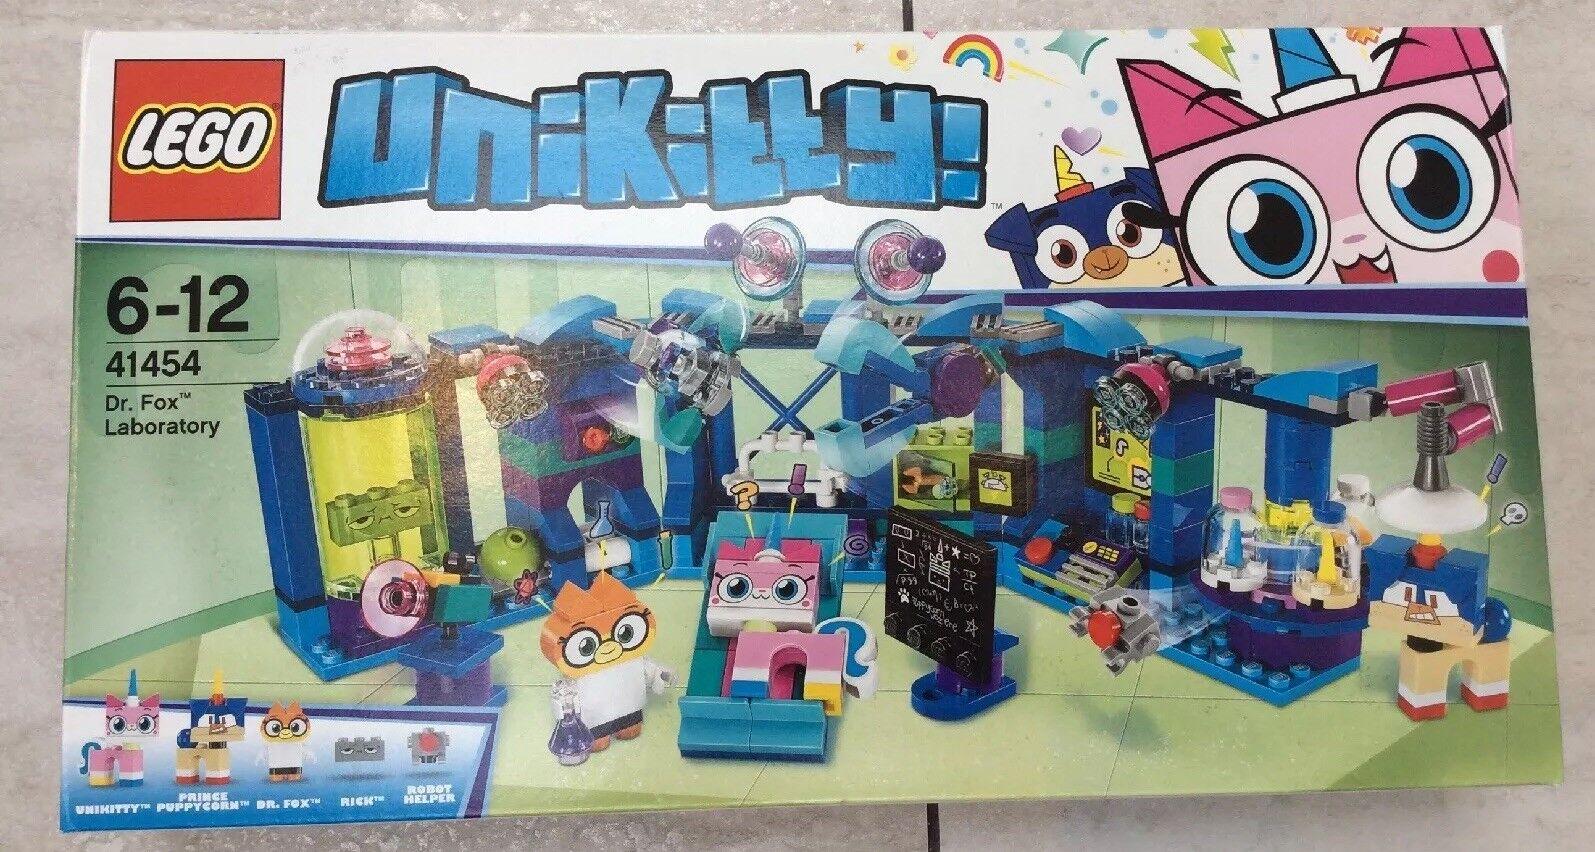 Lego 41454 Unikitty. Dr Fox Laboratory. Lego Movie. BNIB. 6-12 Years. Xmas Gift